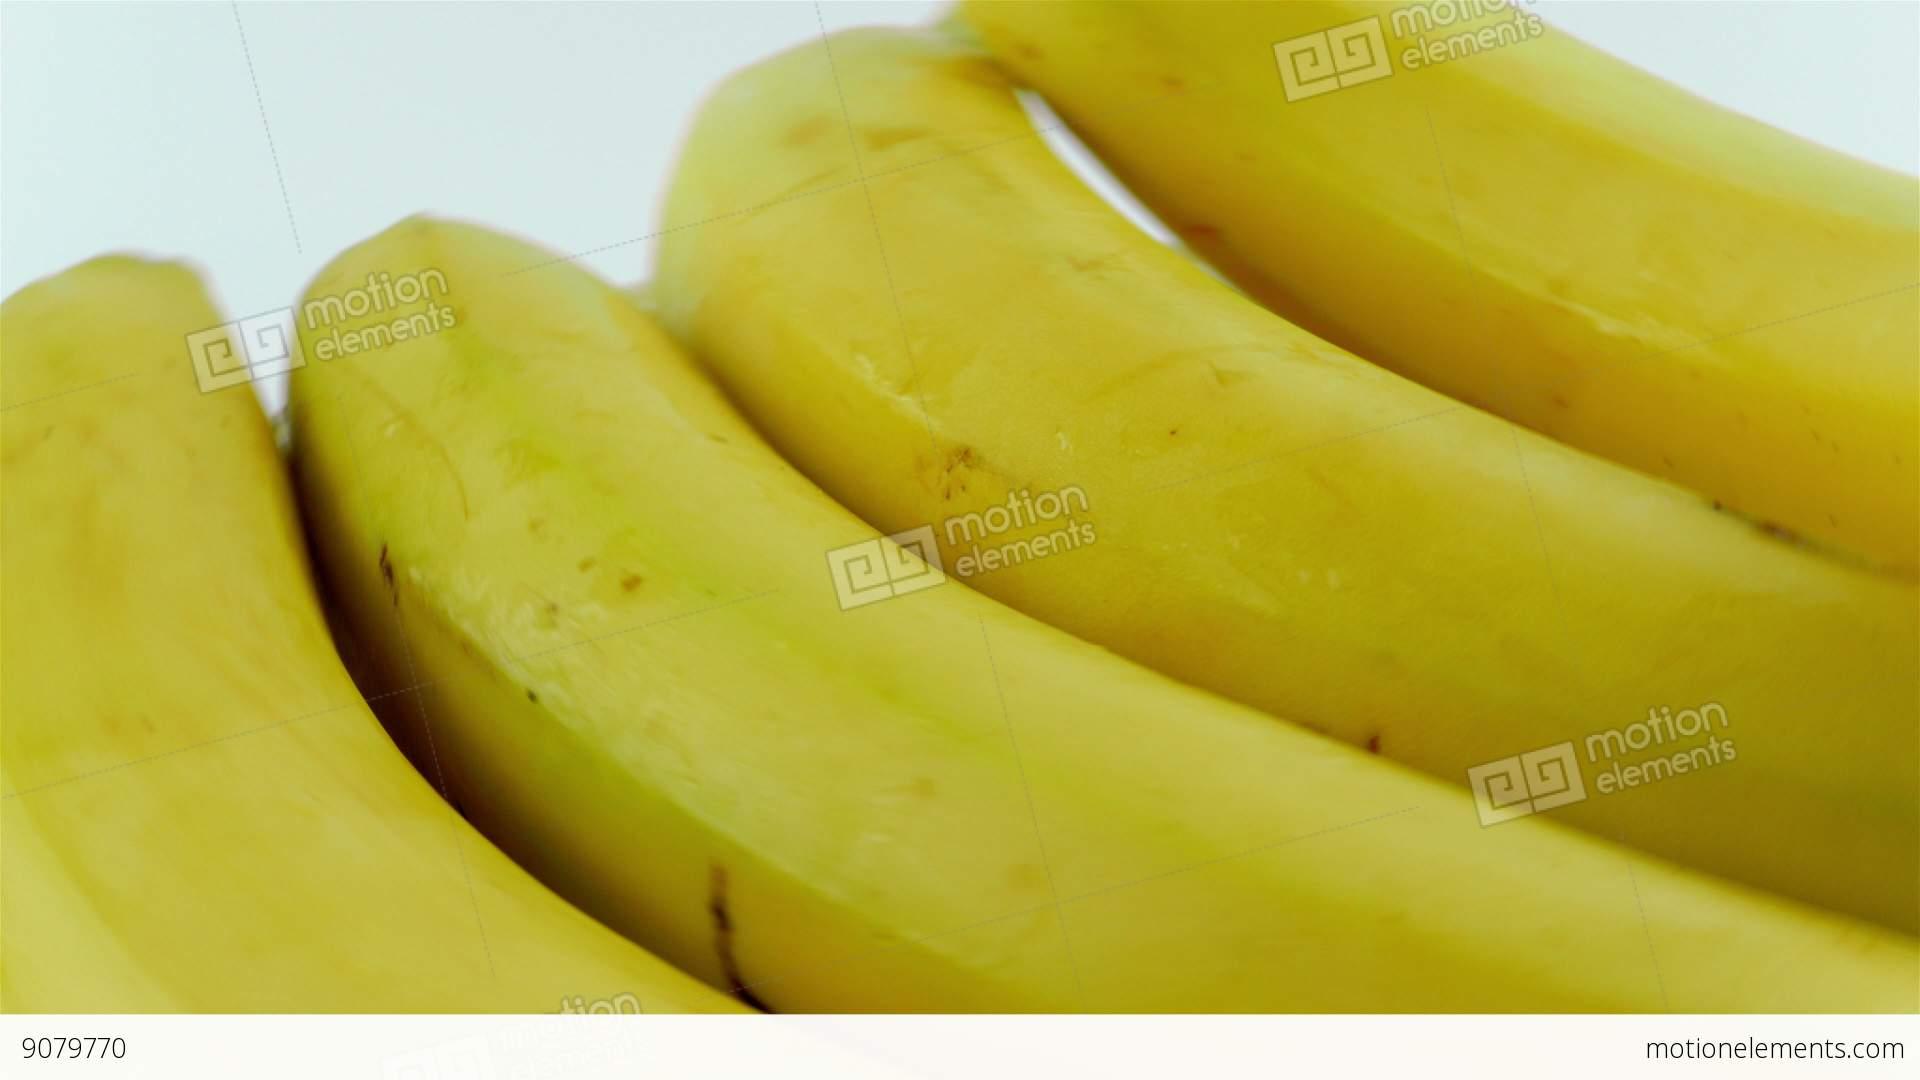 Background image rotate 90 -  Alt Video Close Up Shot Of Rotating Organic Bananas White Background